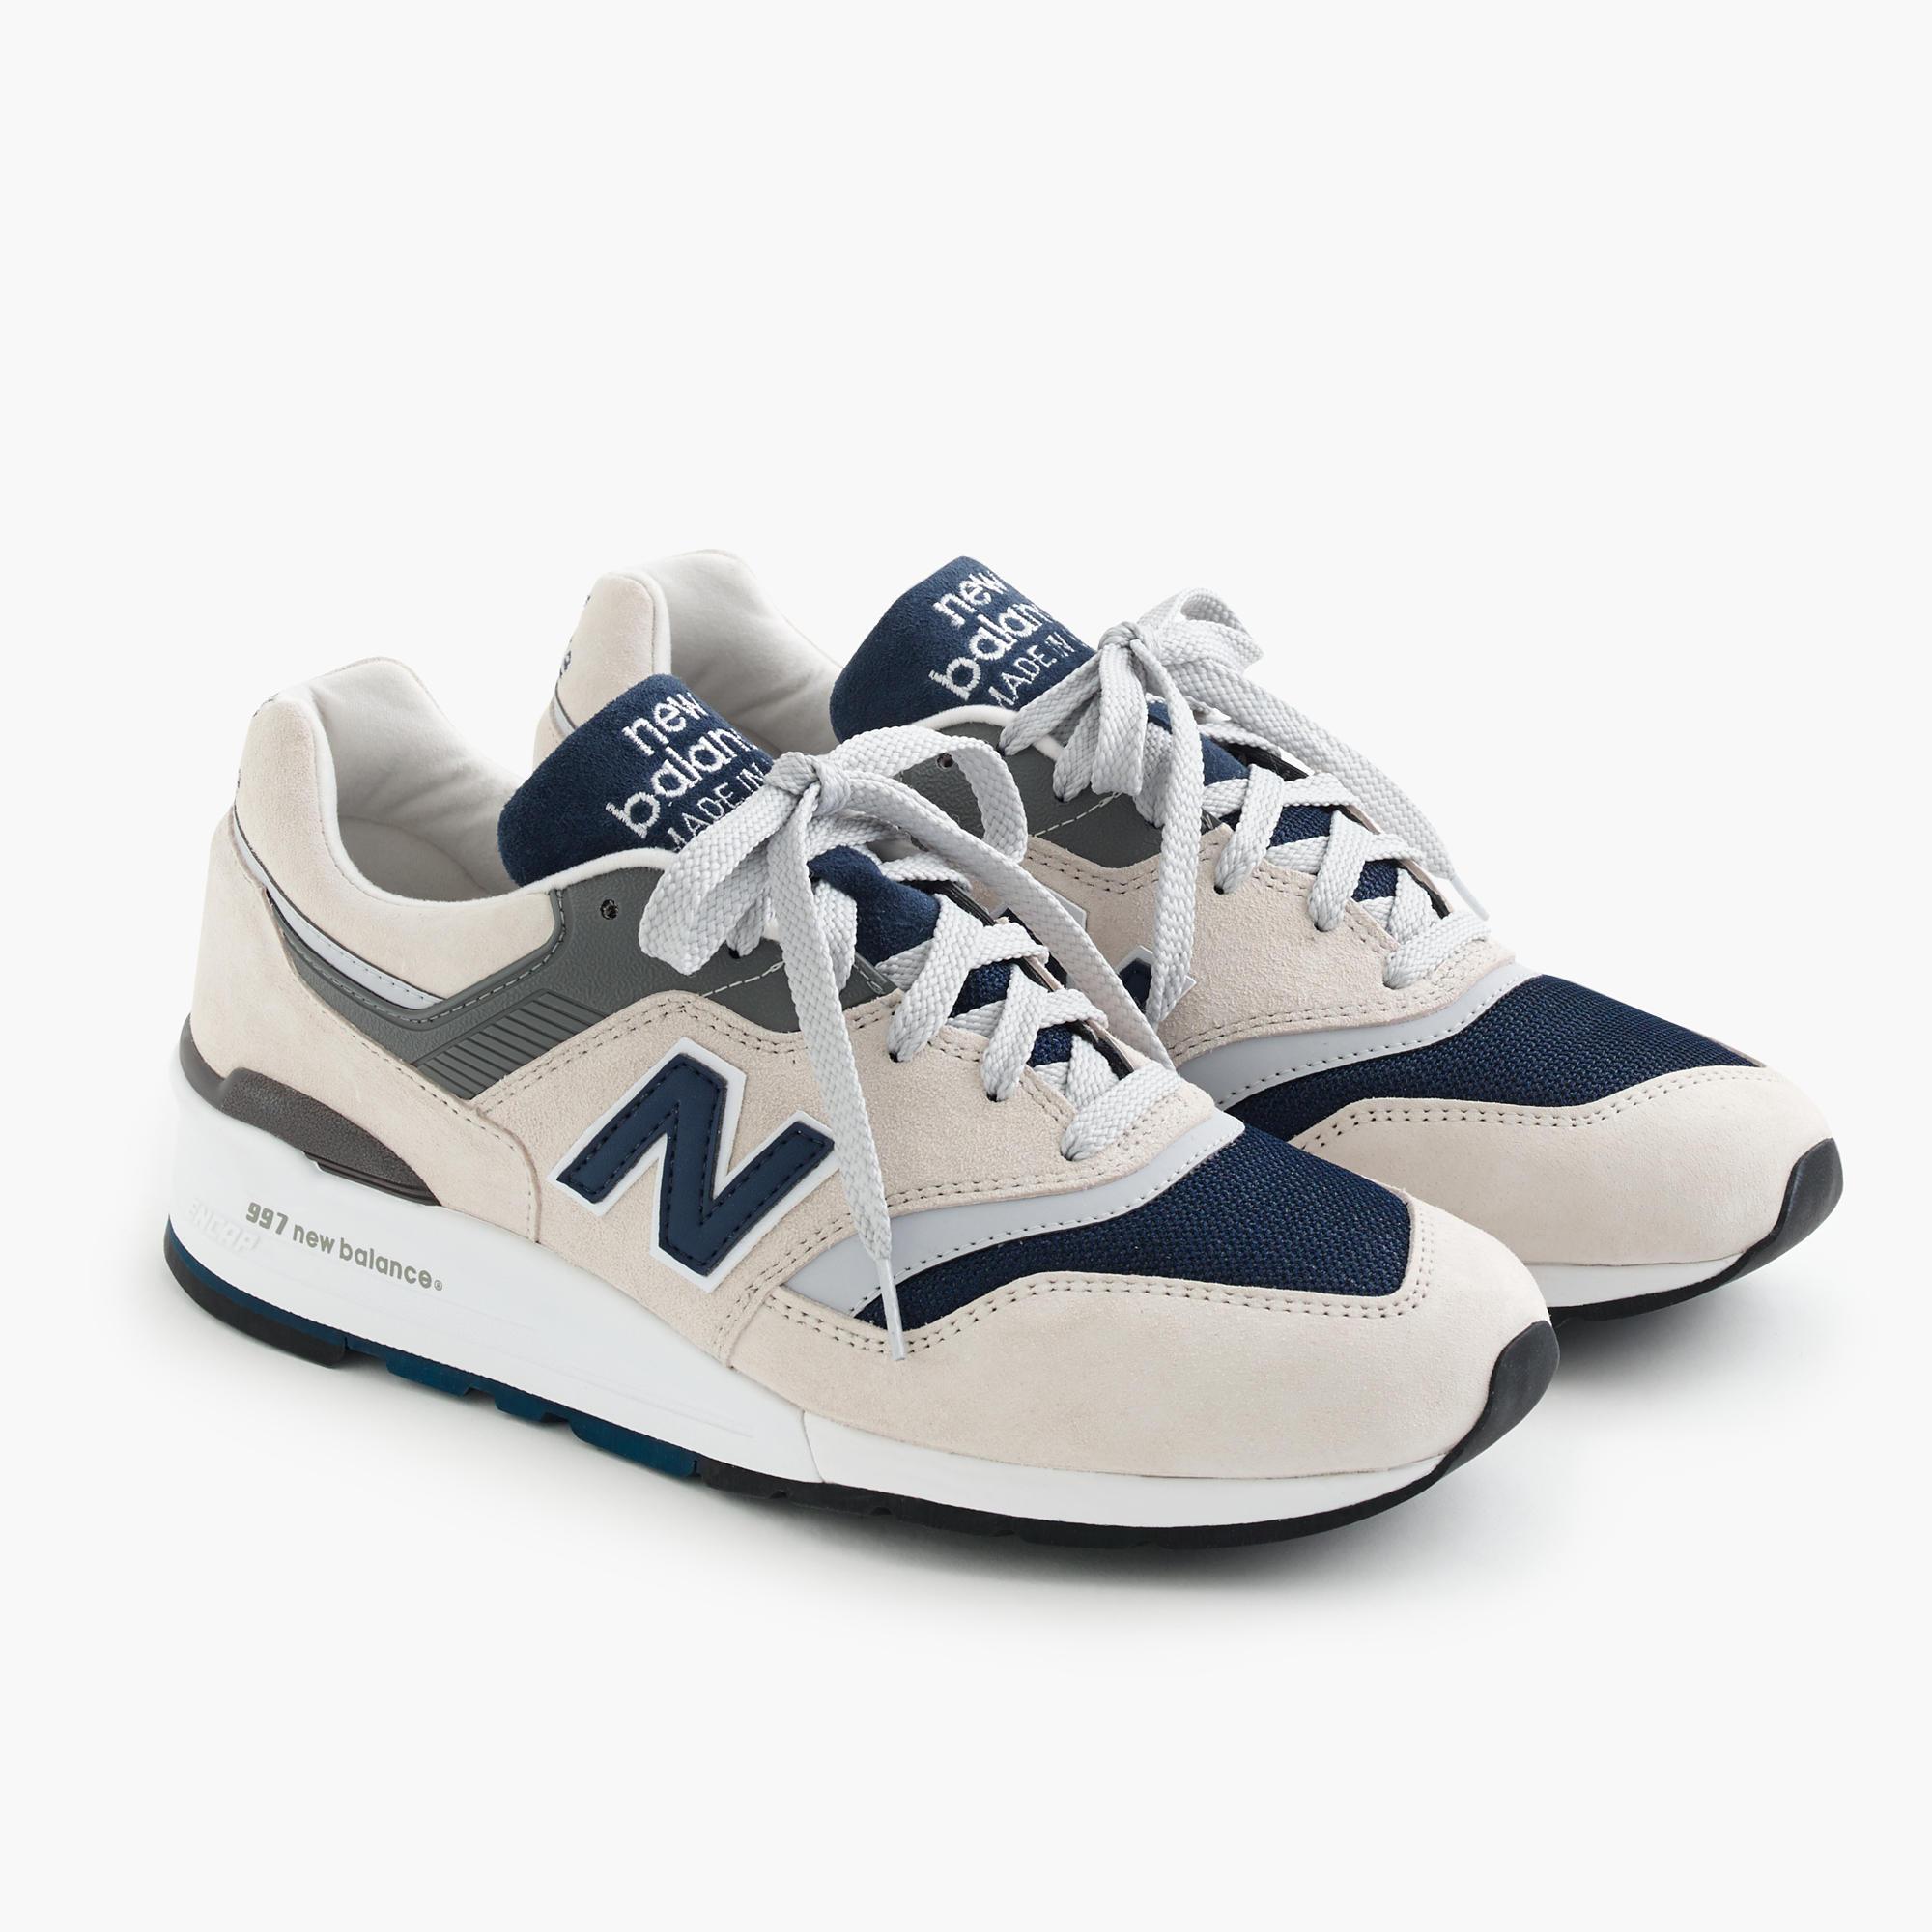 new balance 997j